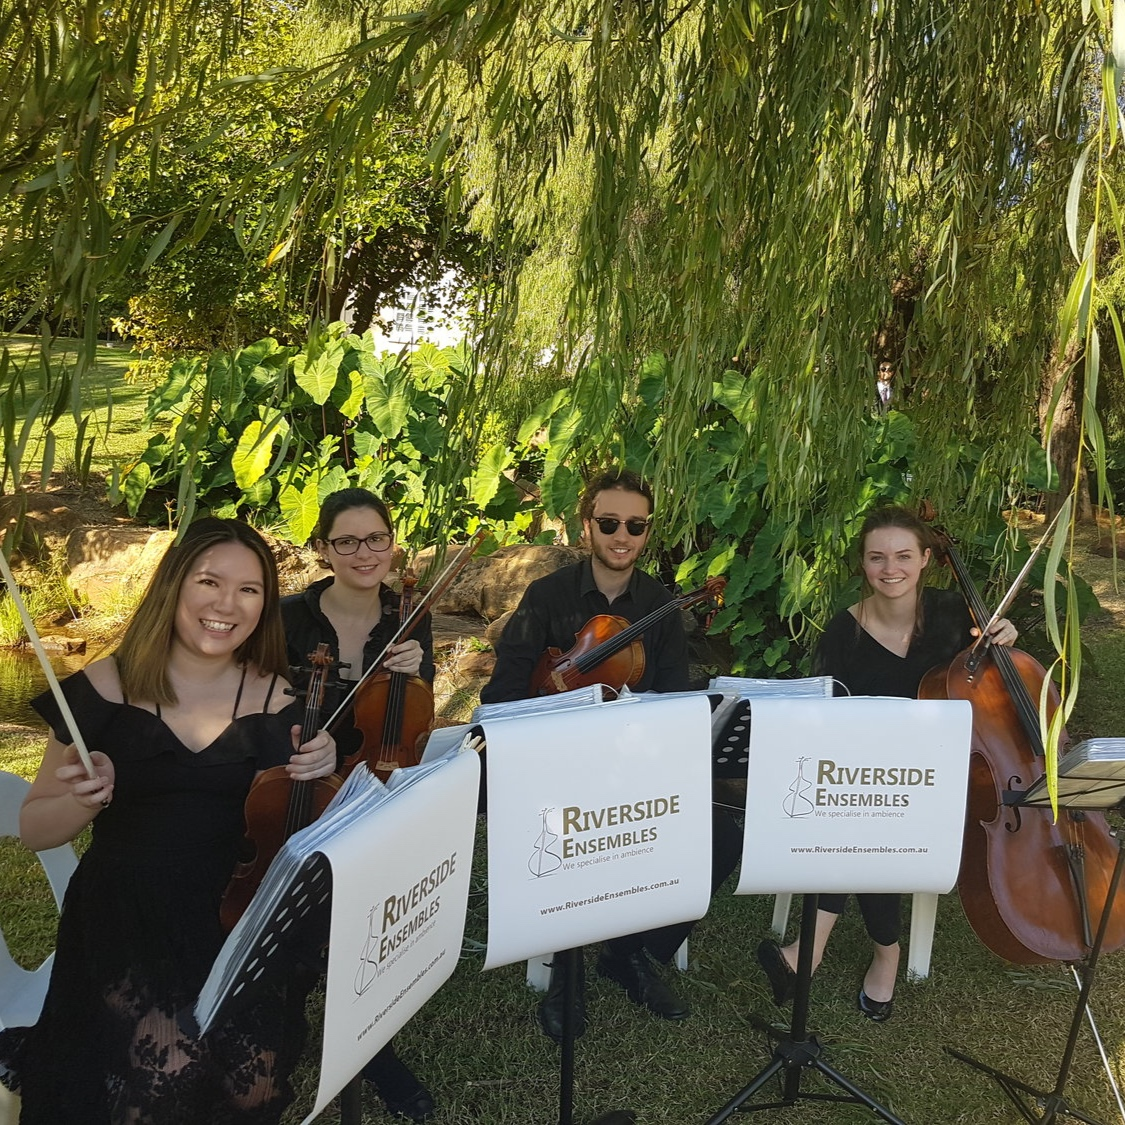 perth-function-string-music-hire-wedding-riverside-musicians-quartet-violinist-viola-cellist